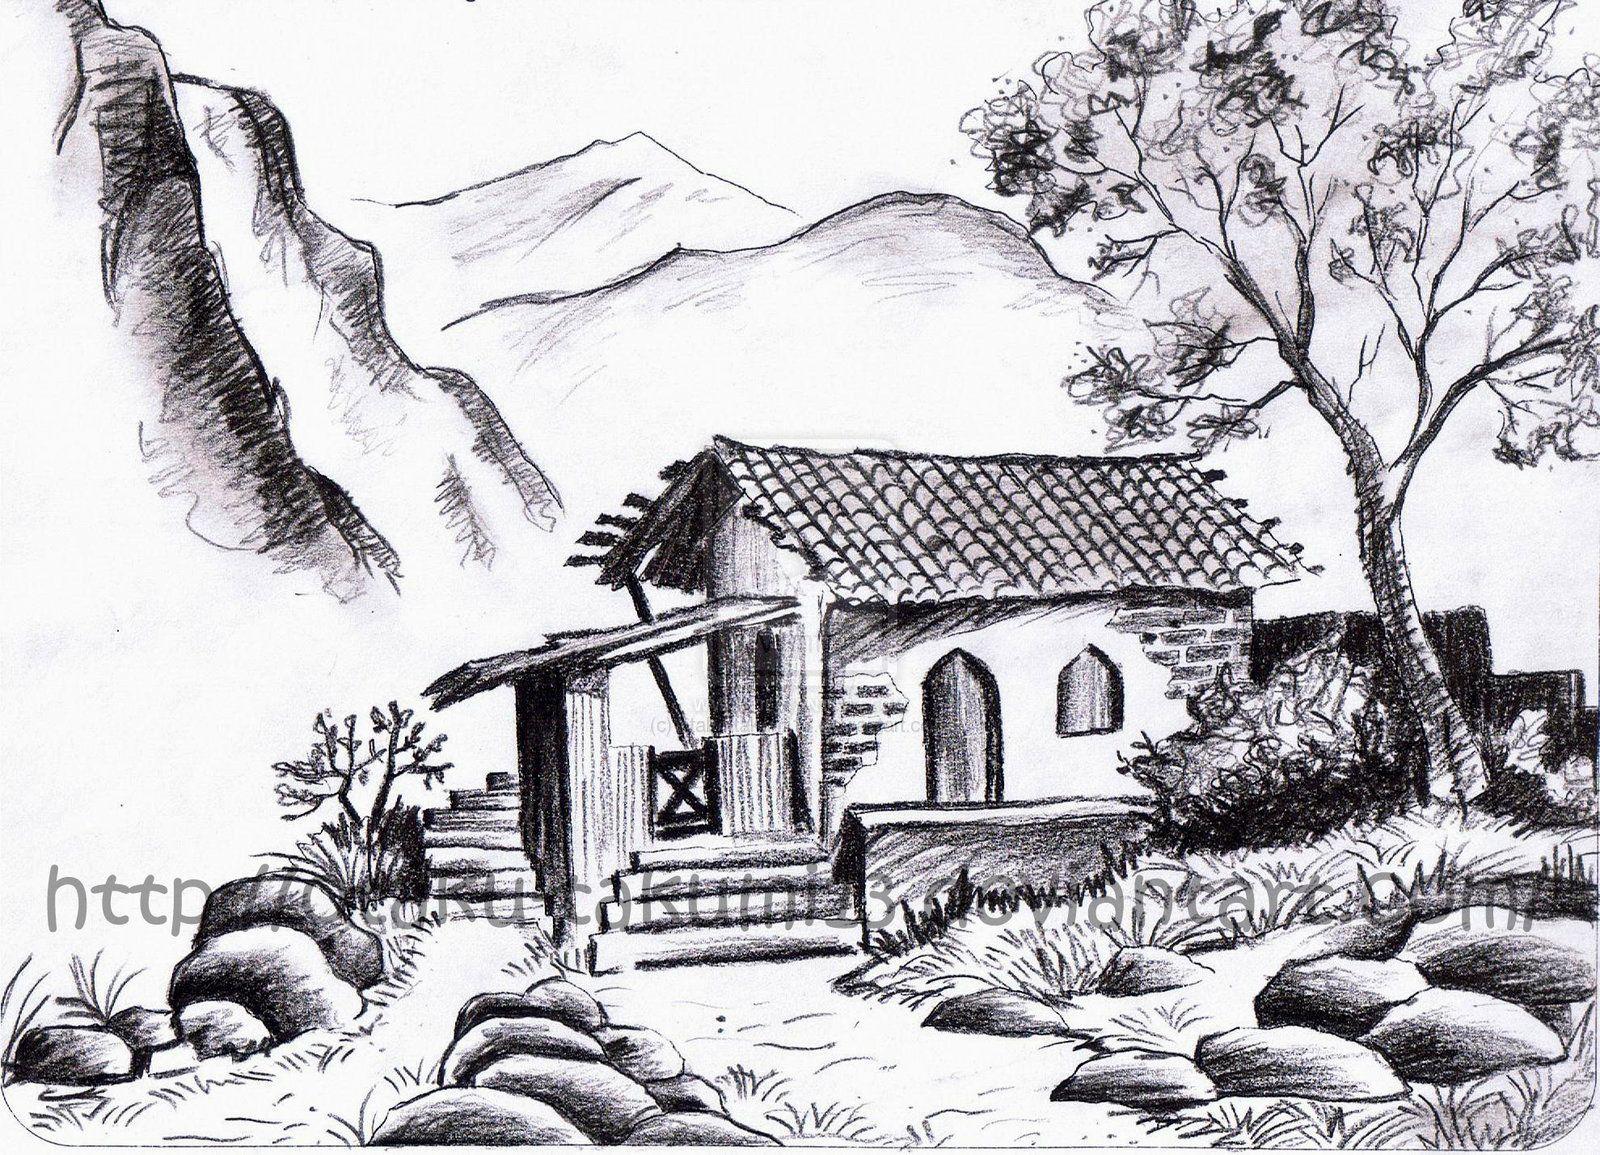 Landscape drawings in pencil landscapes scenery 2011 2015 jibari chan monochromatic drawing pencil